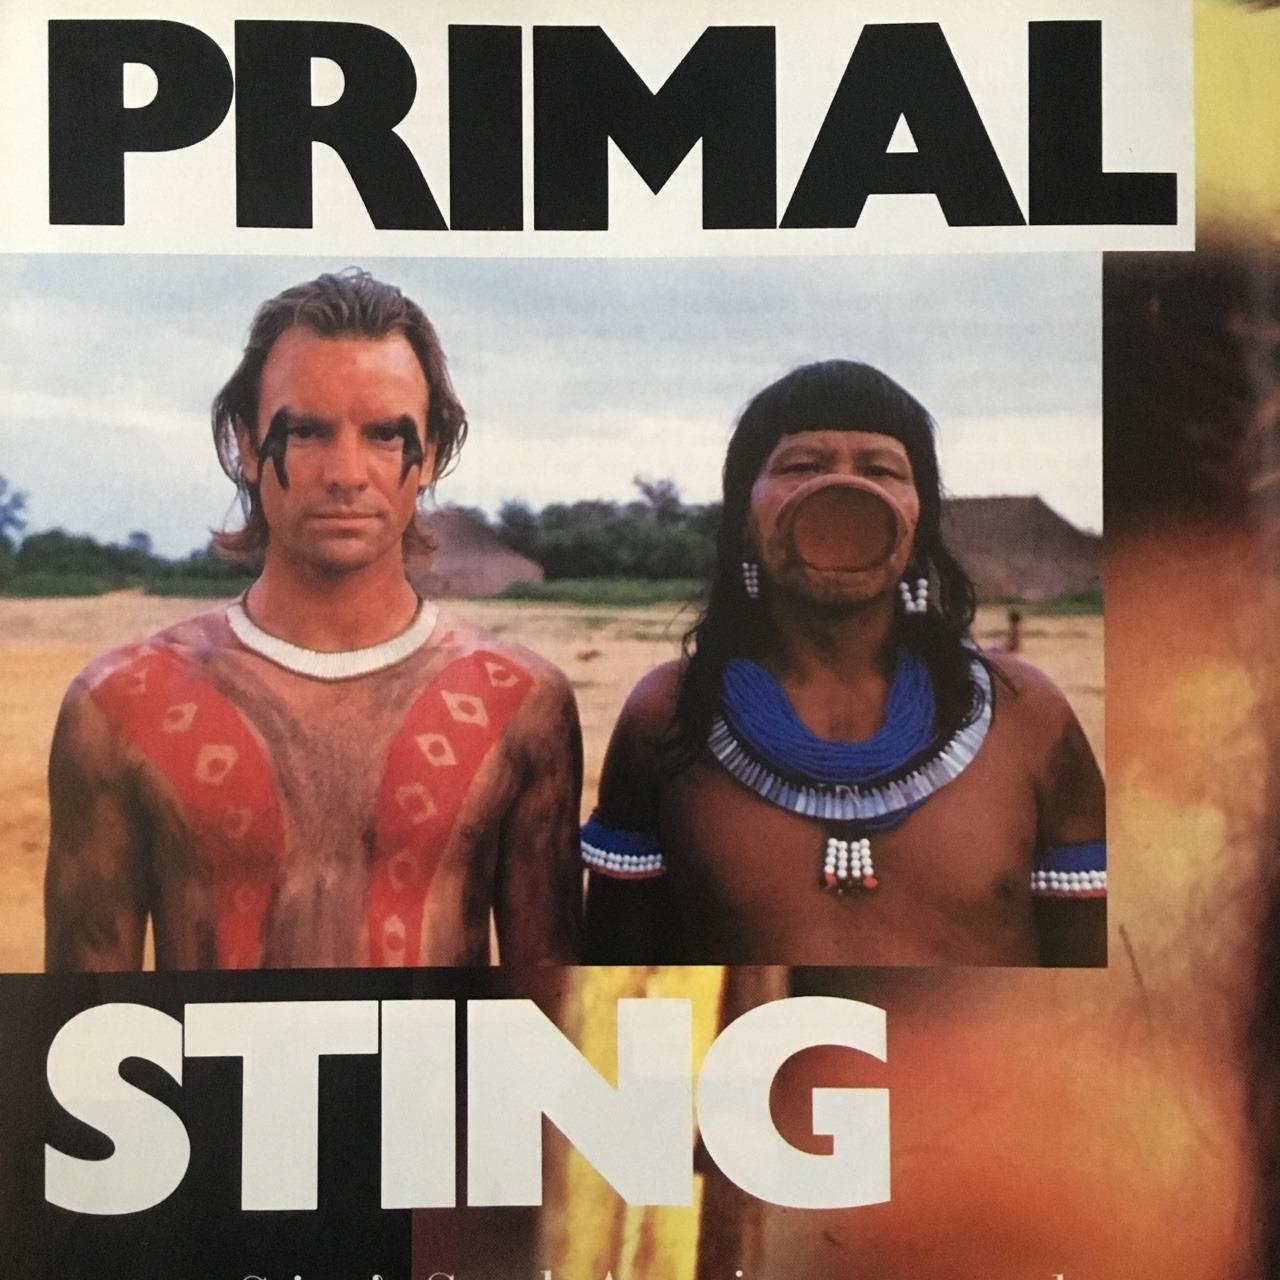 Primal Sting.     Vogue. June 1988.